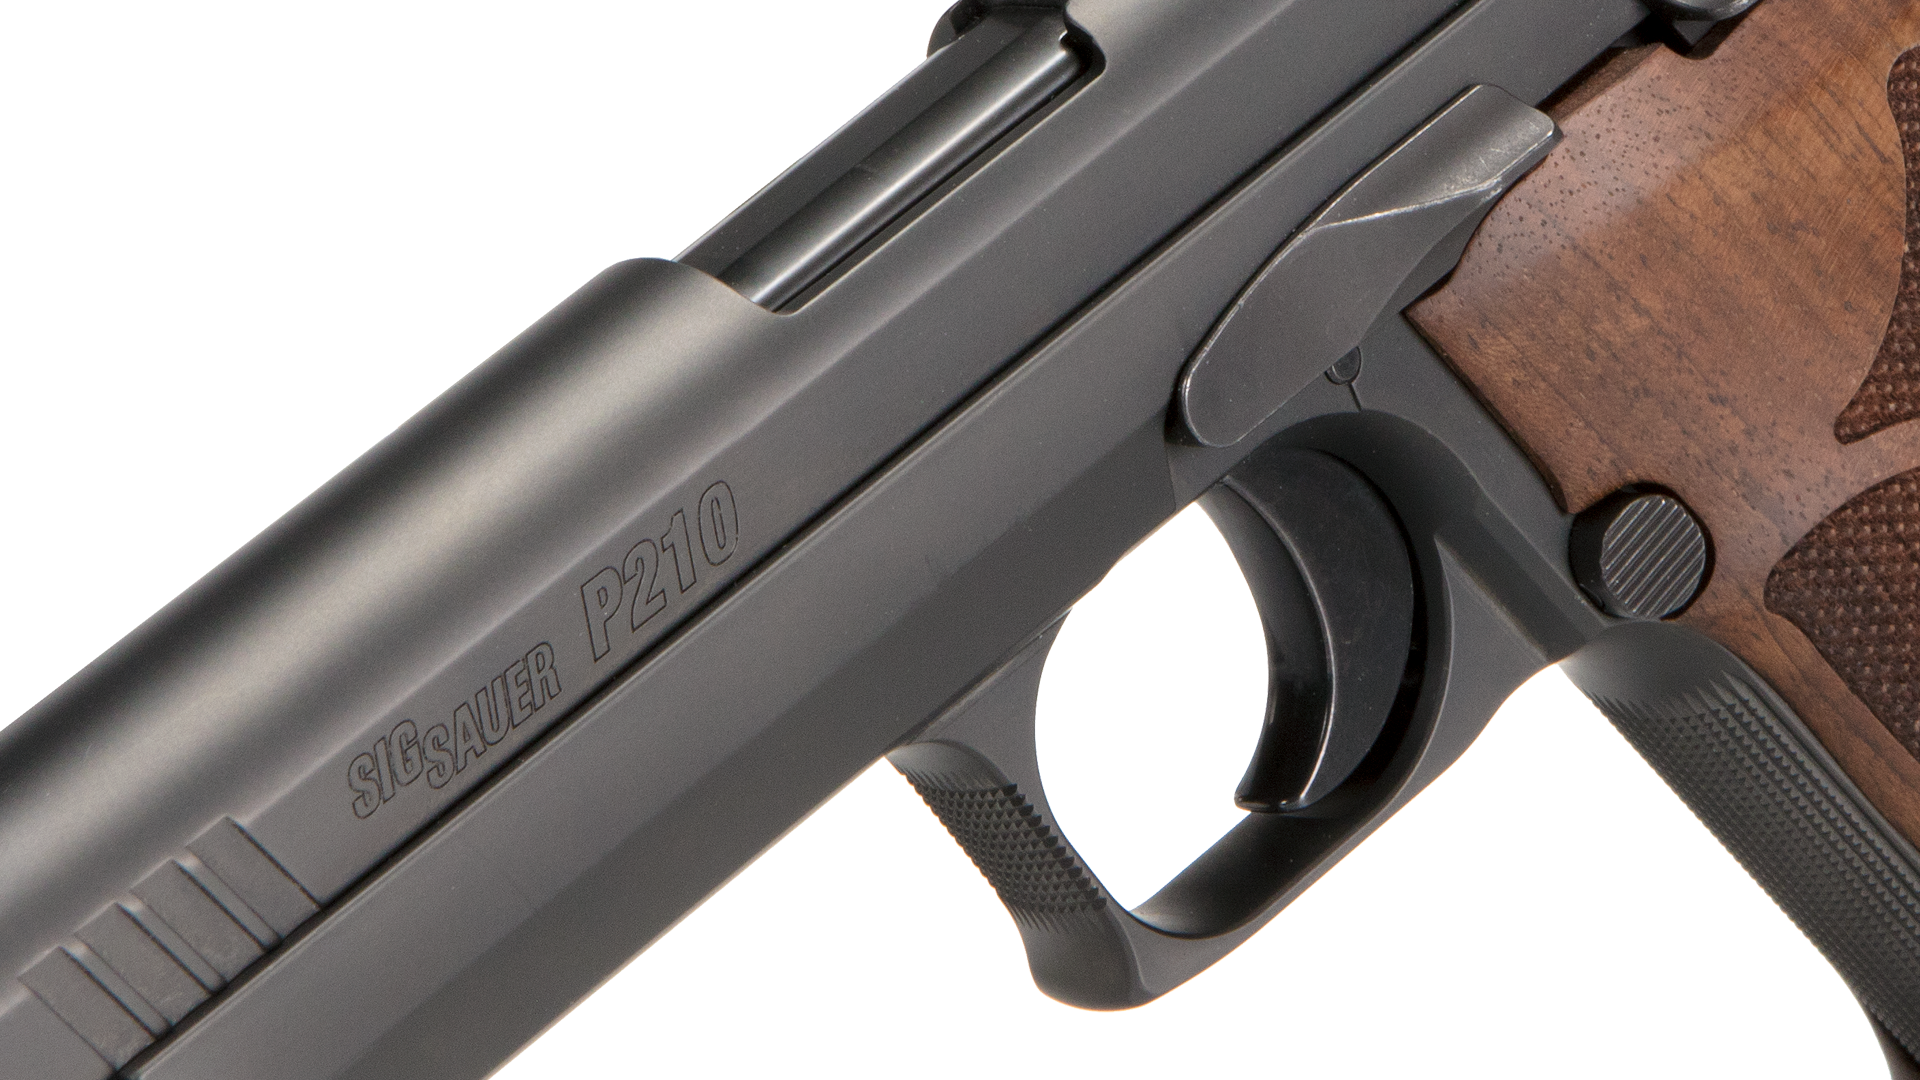 P210 Target trigger